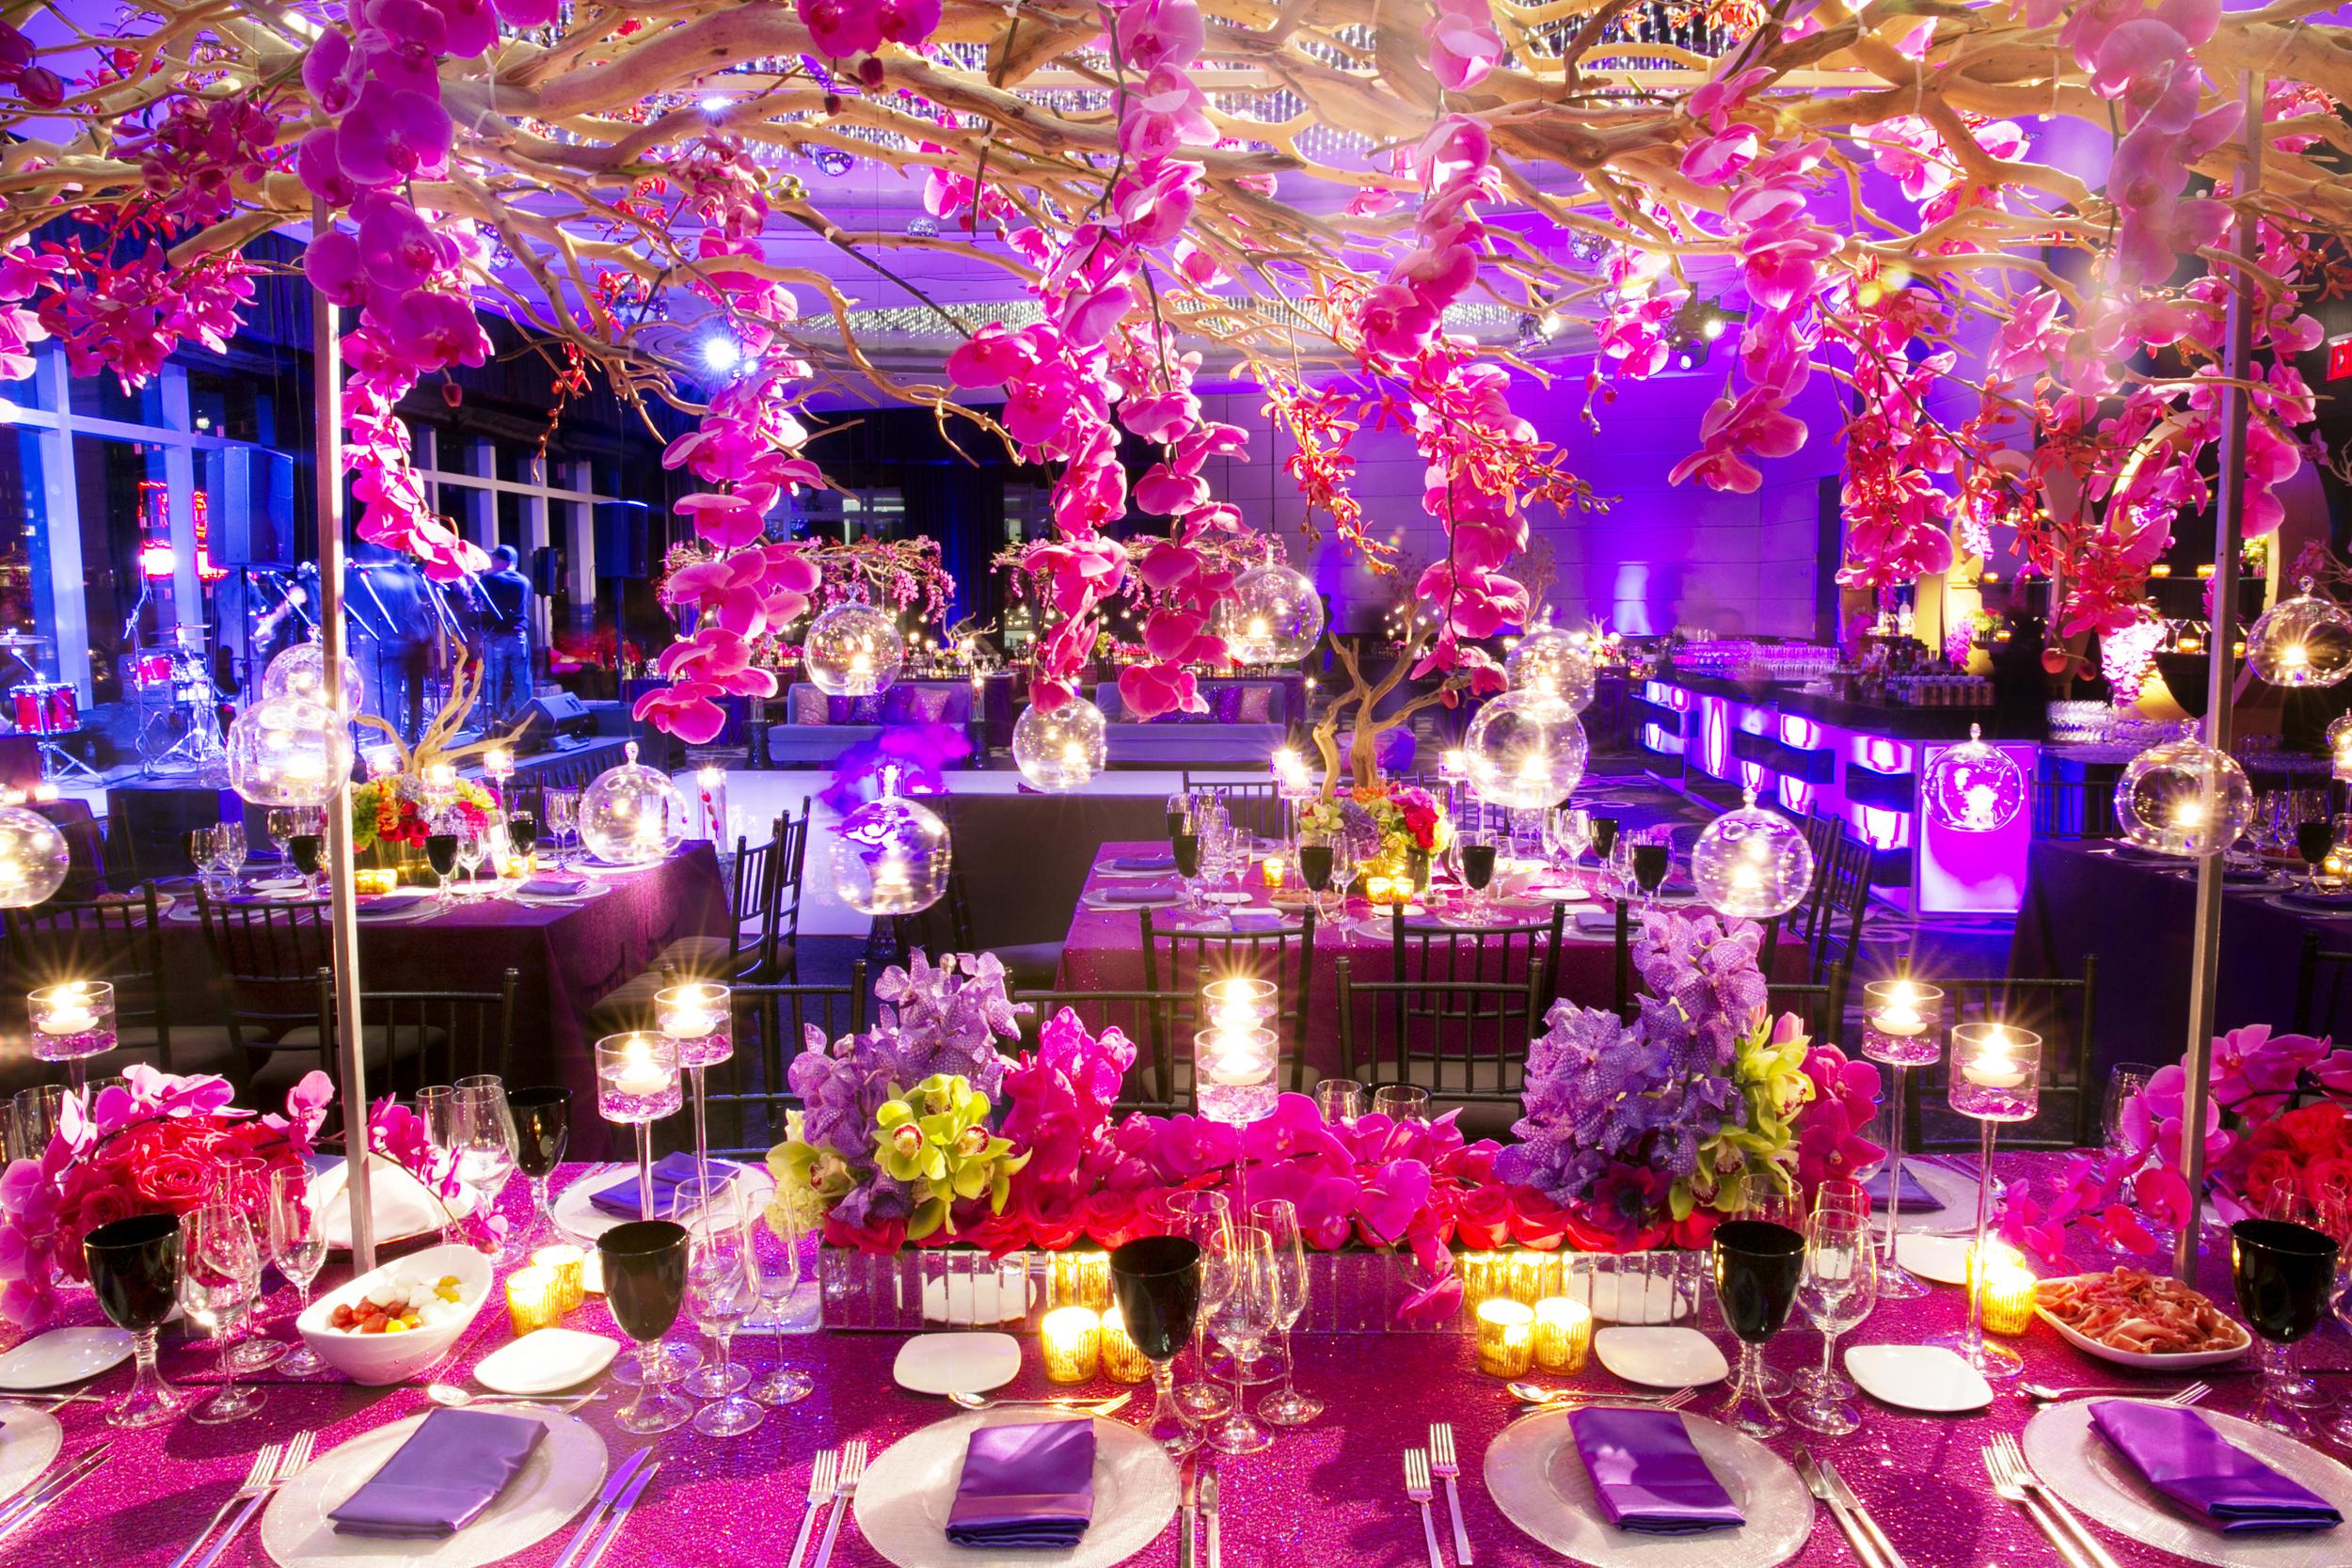 NYC-Wedding-Planner-Andrea-Freeman-Events-Mandarin-Oriental-11.jpg